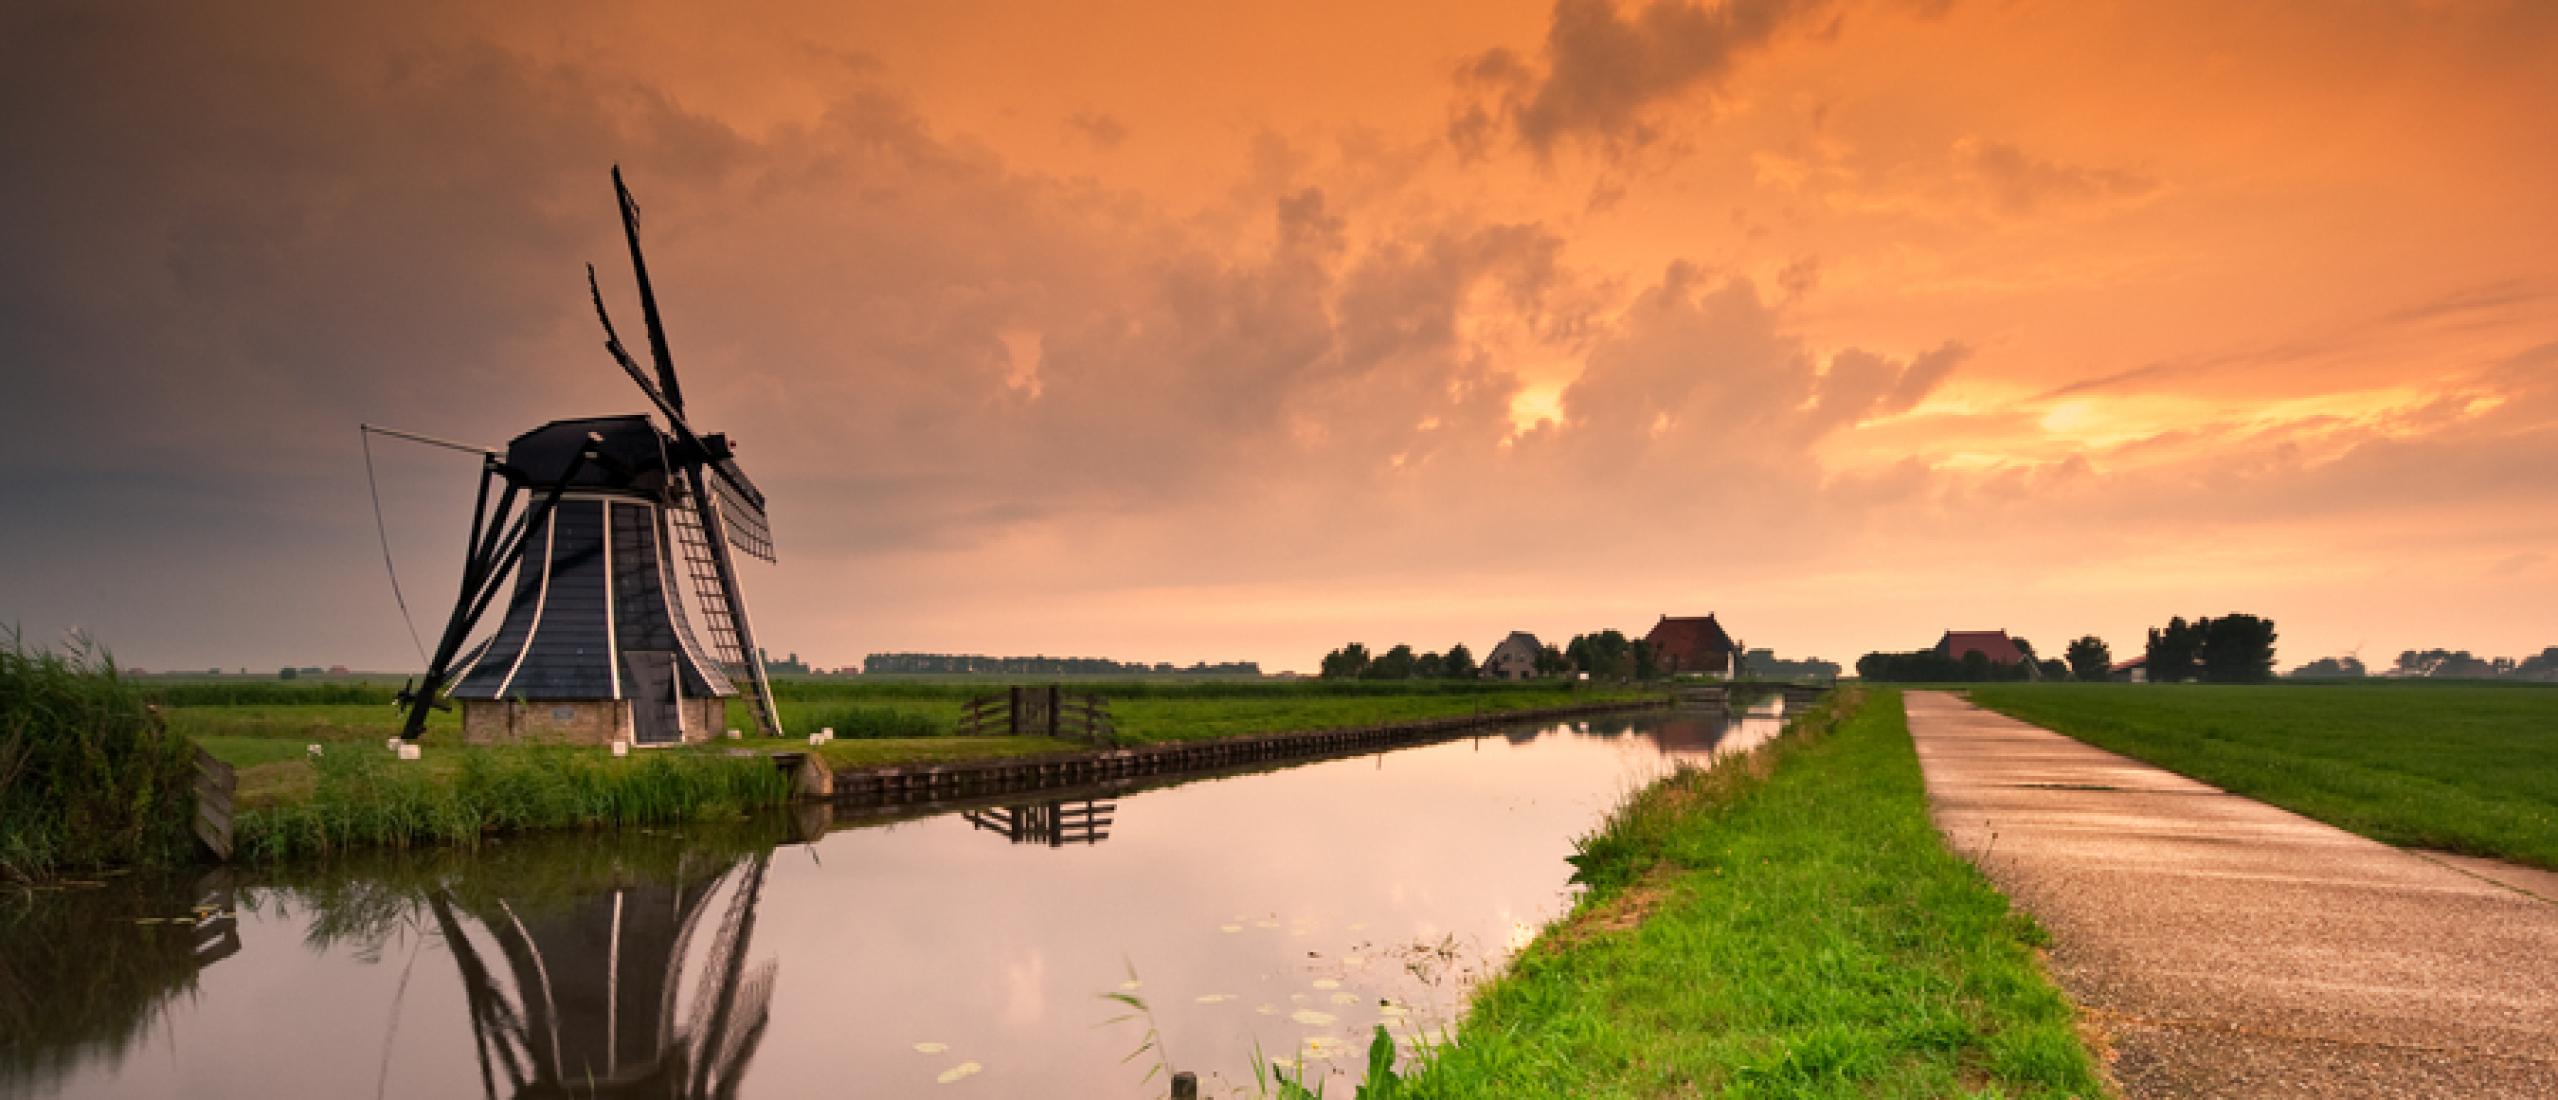 Groepsactiviteiten in Zuid Holland die jij moet doen!